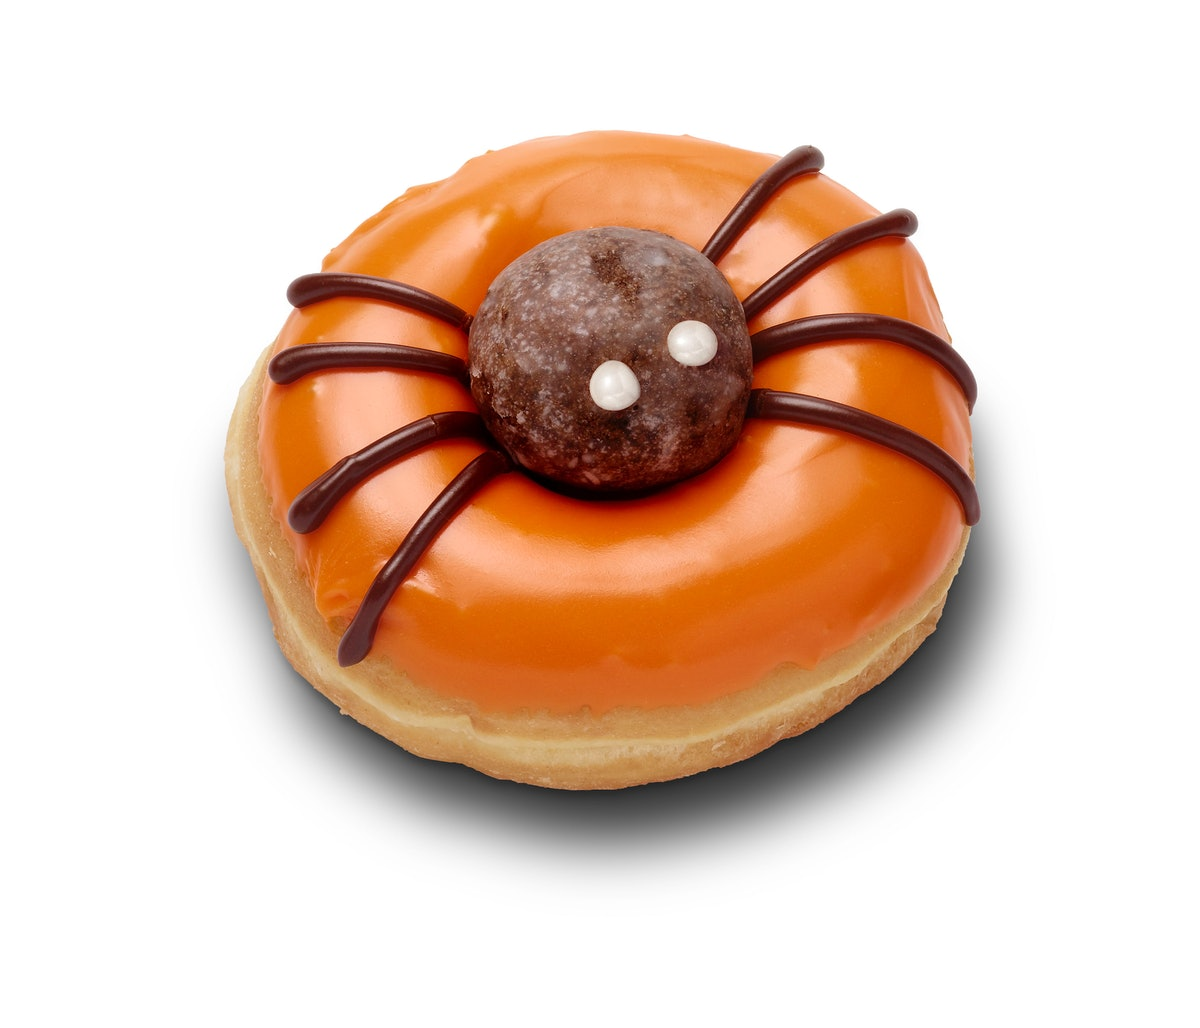 Dunkin' is bringing back a fan-fave Halloween donut.